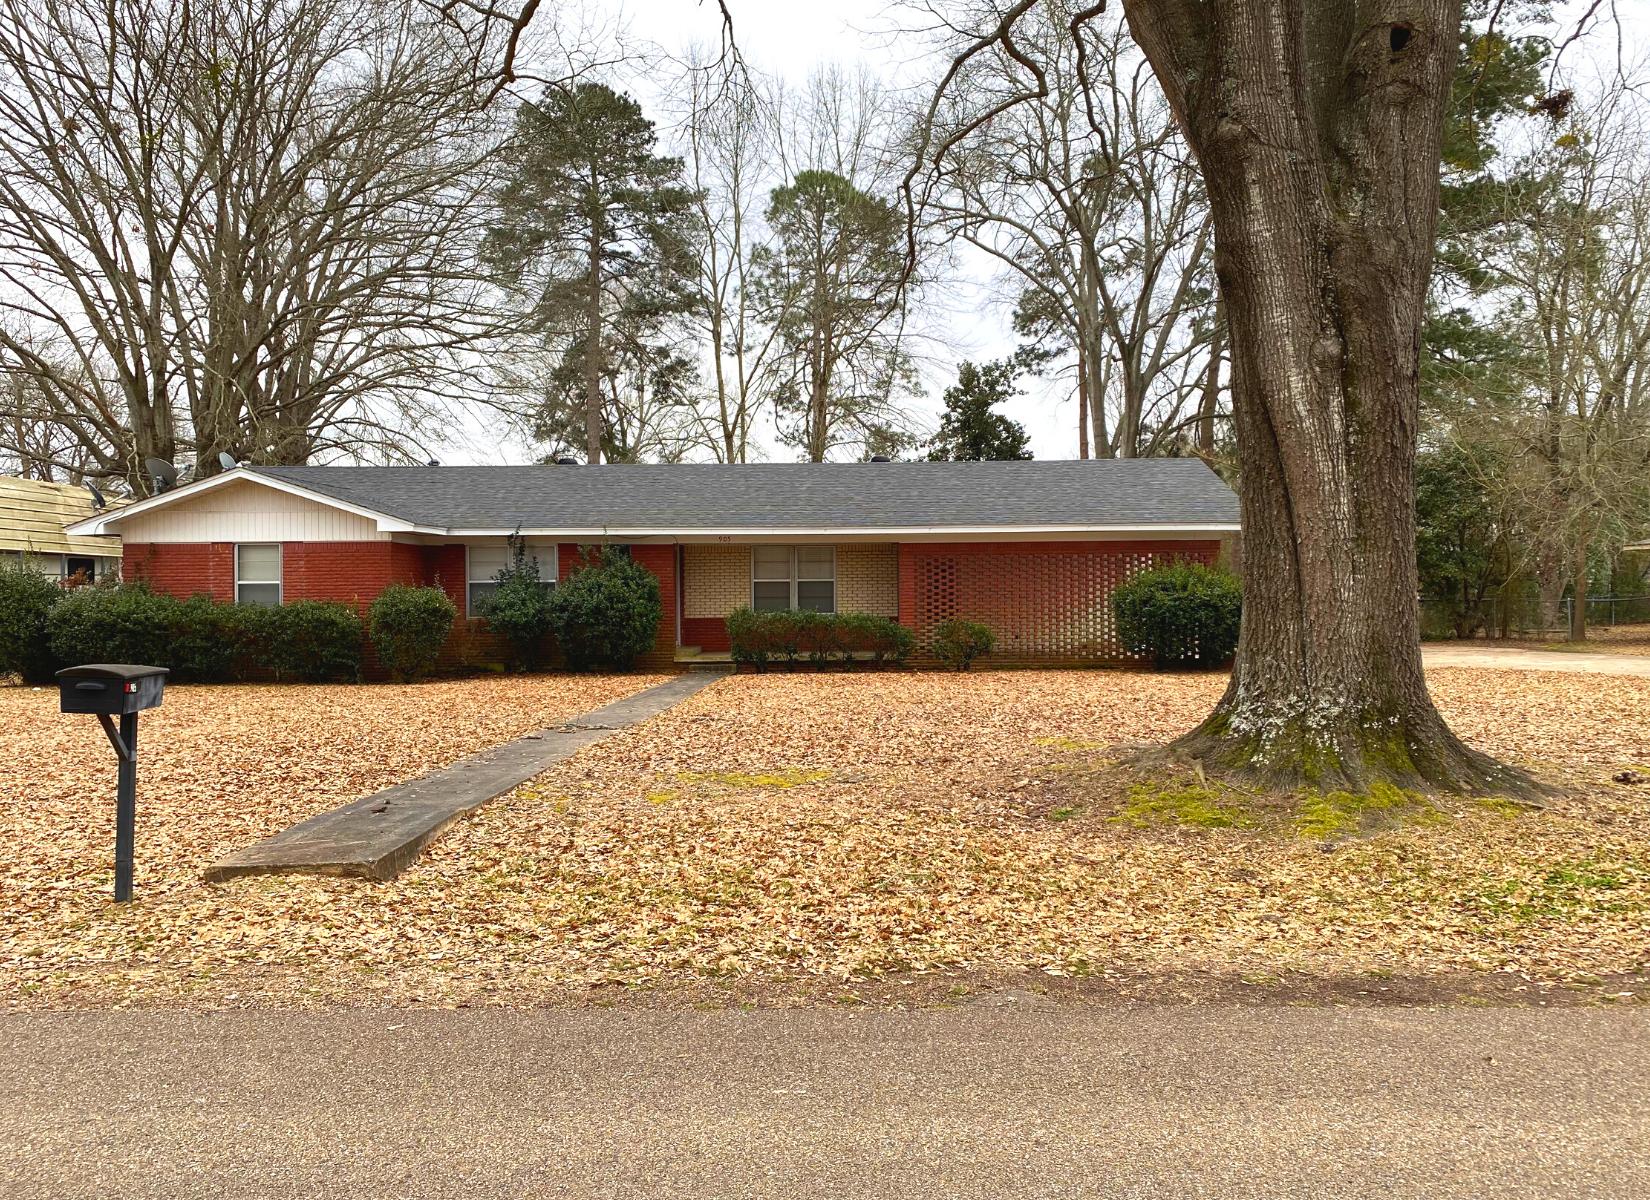 Brick home in town for sale in Atlanta, Texas